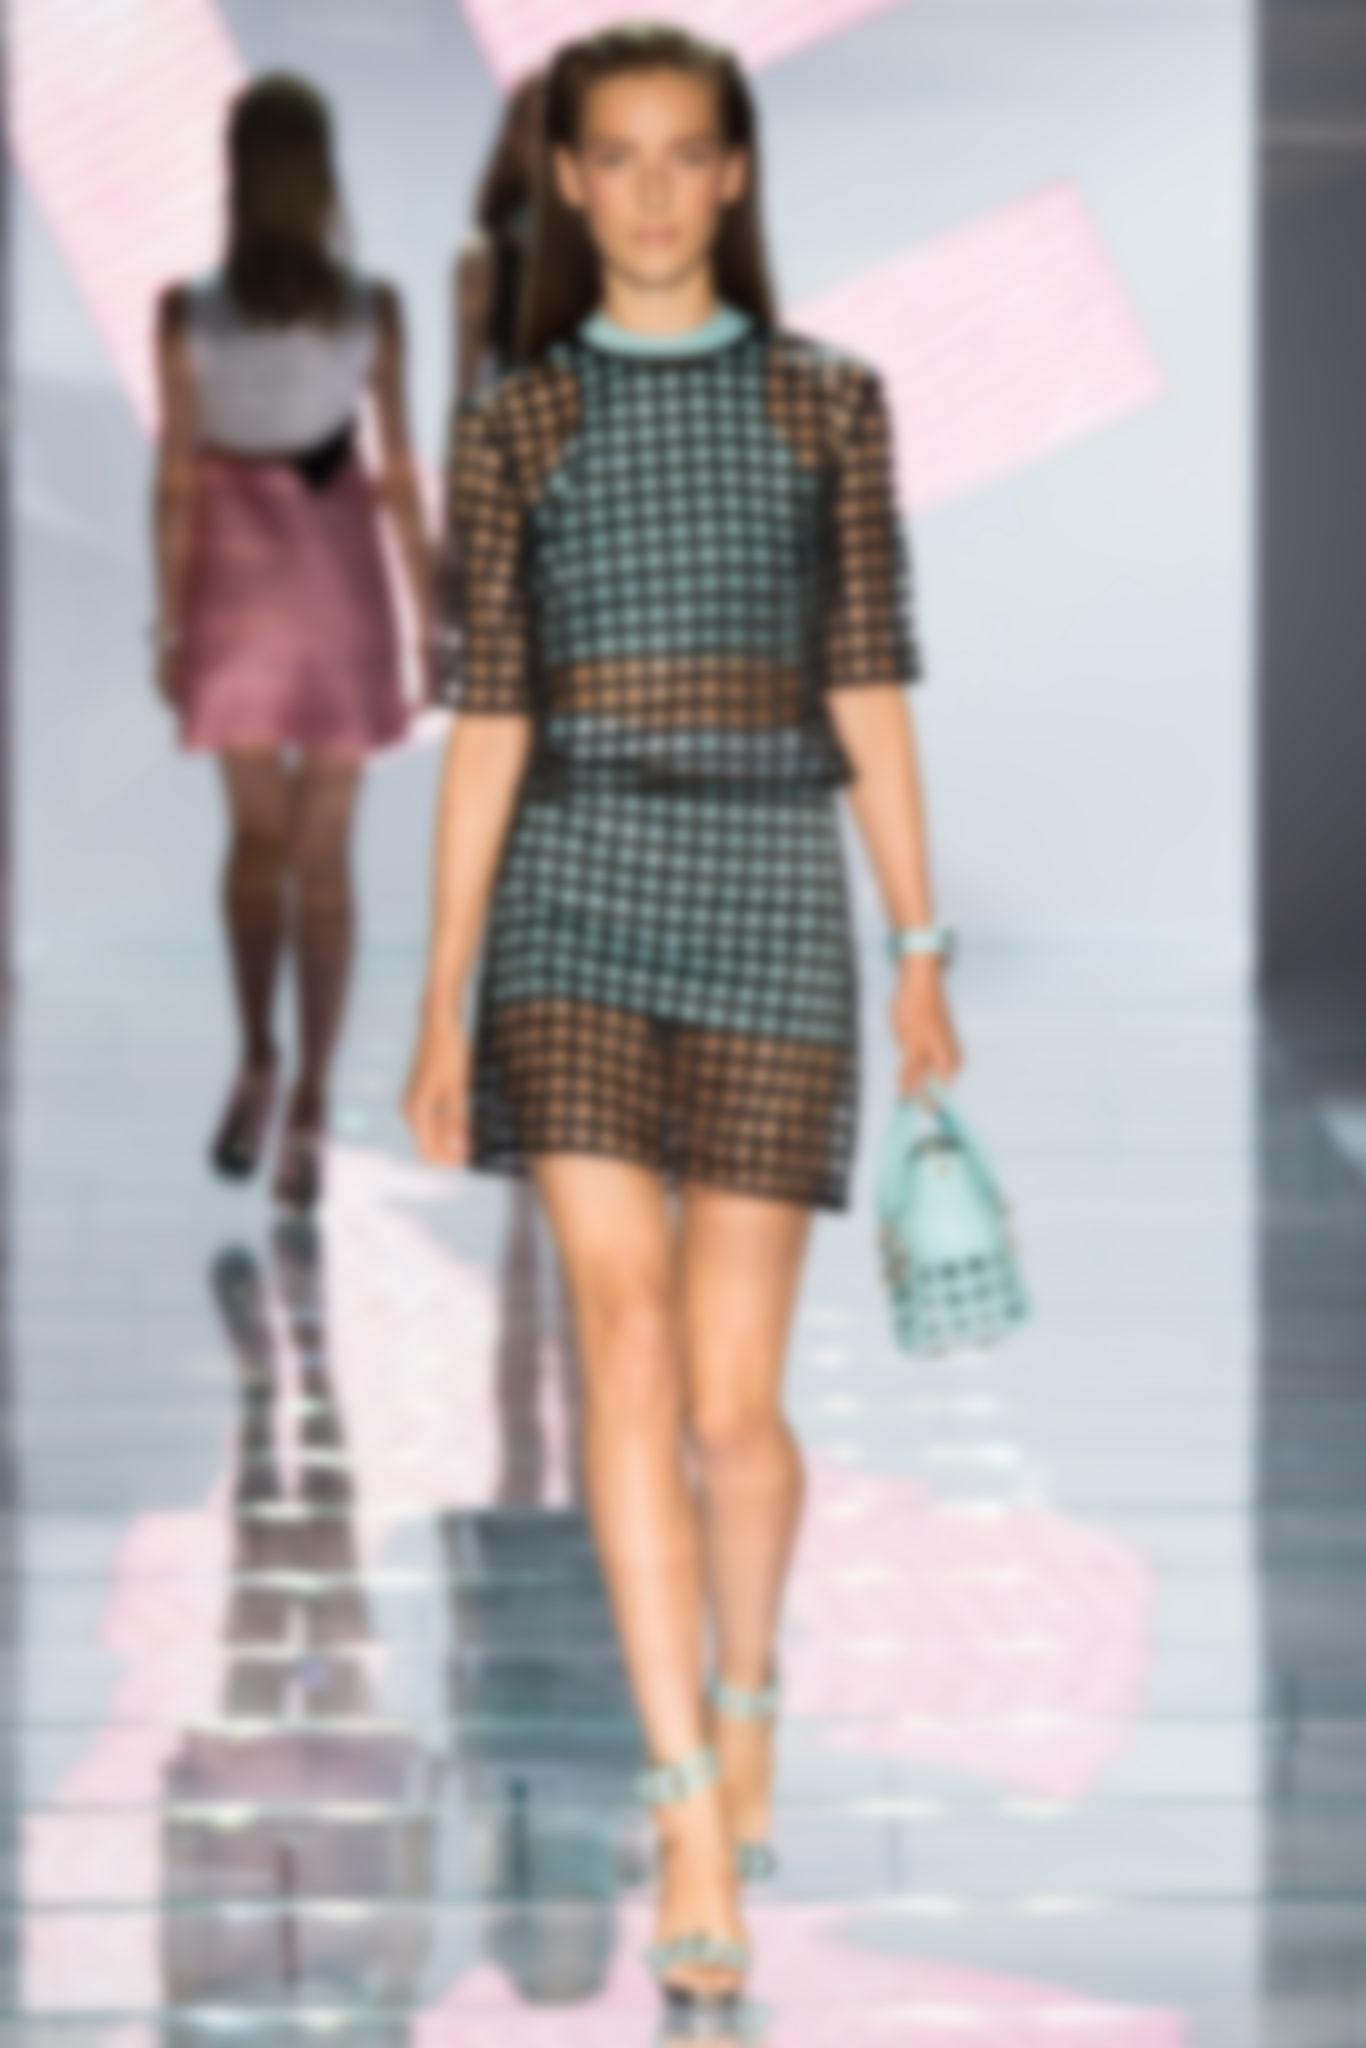 41d7e4e1fd4 Мода 2019 года (фото) в женской одежде  весна-лето